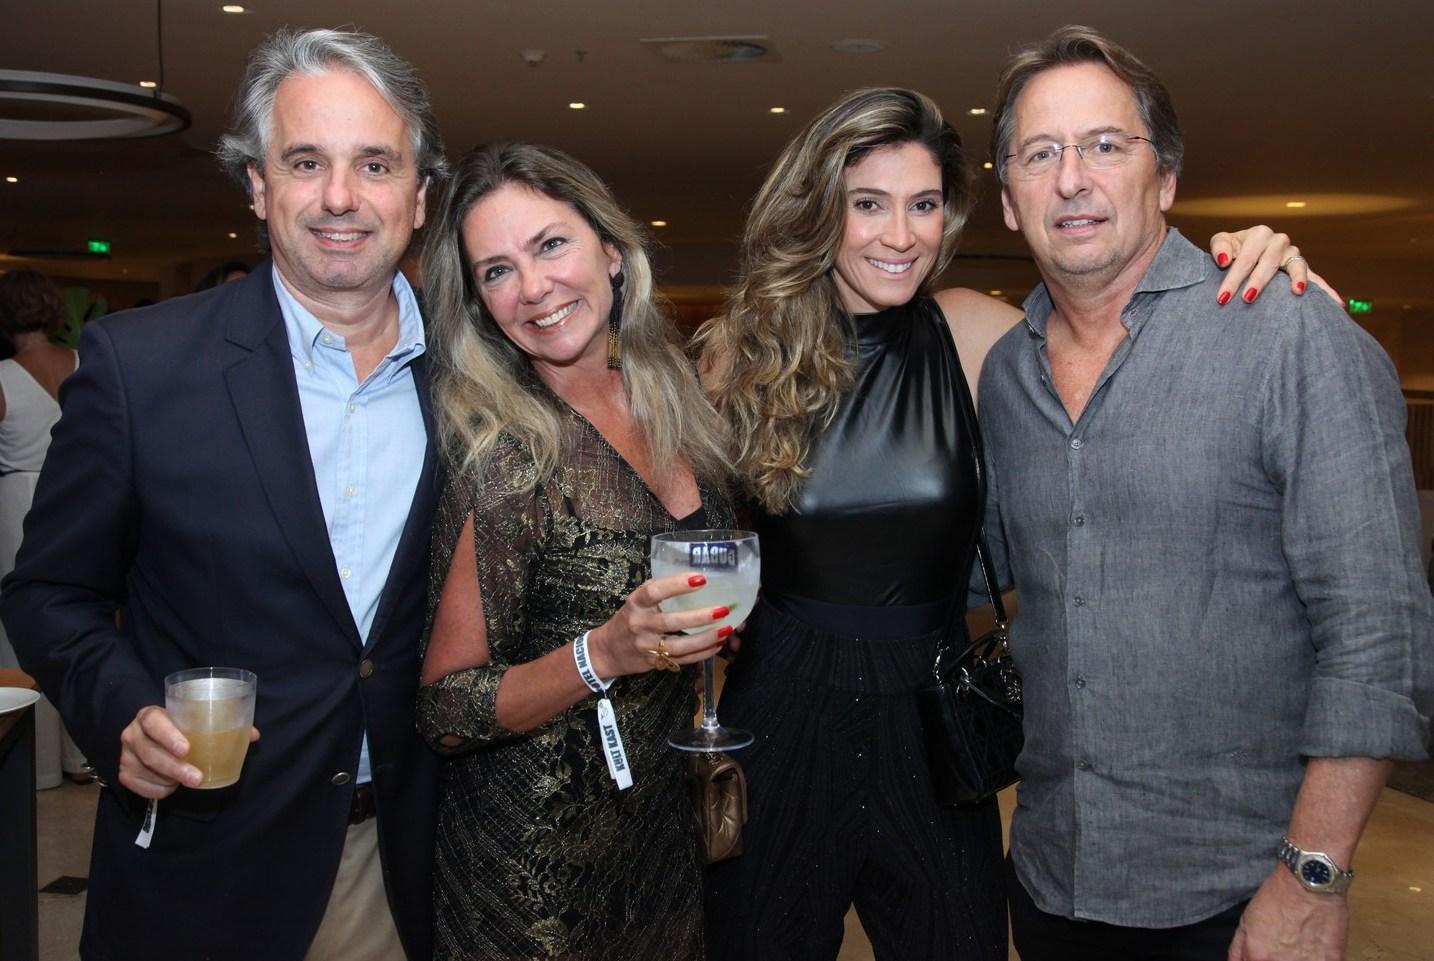 Pedro Senna, Marcia Verissimo, Simone Cavalieri e Janick Daudet /Foto: Vera Donato